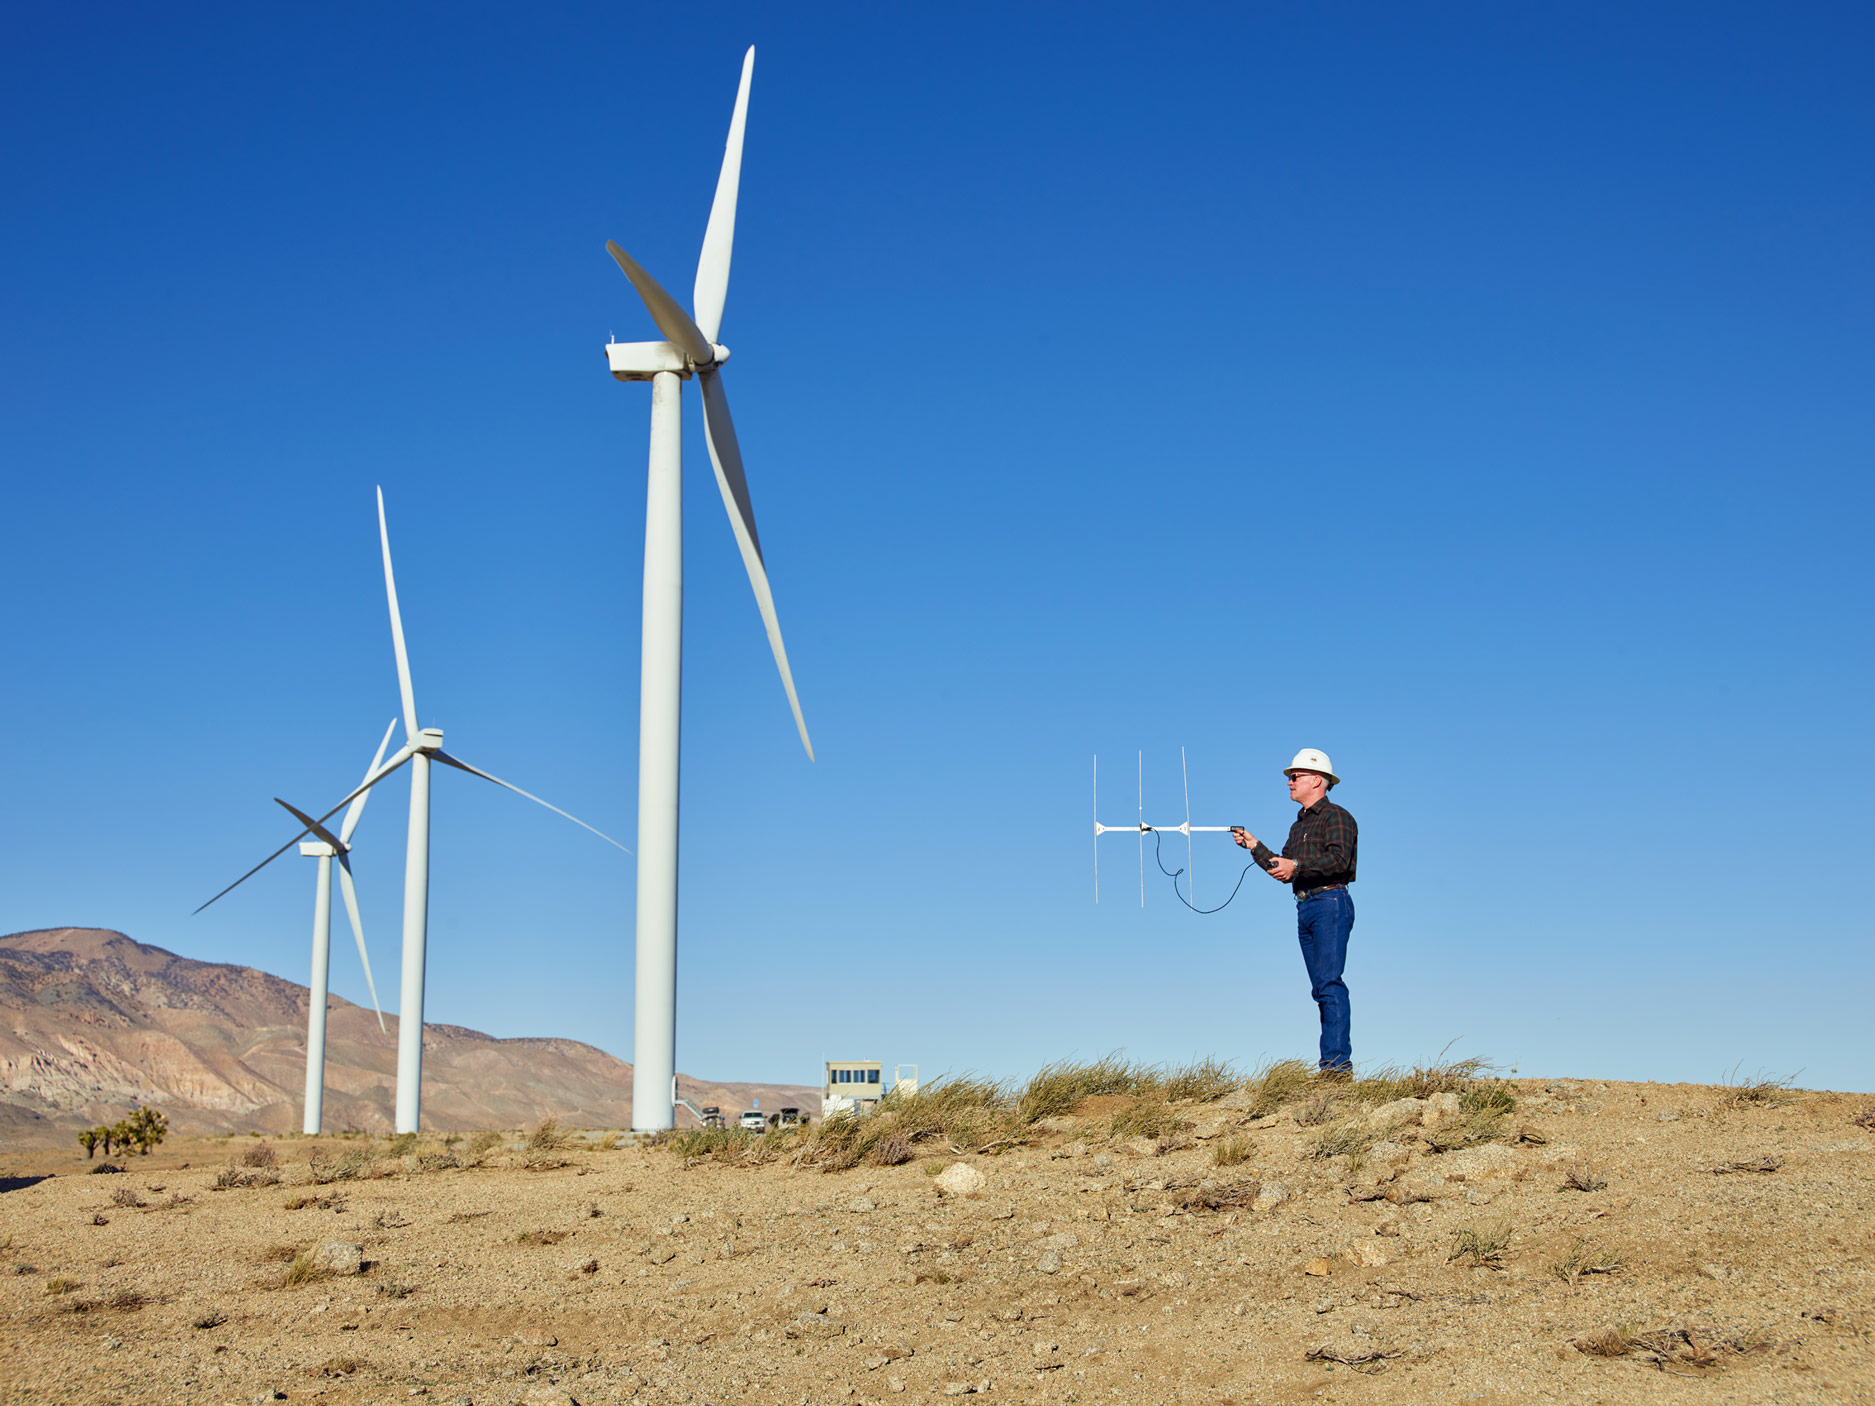 Scanning for Condors, Tehachapi Wind Resource Area, Kern County, California, 2018